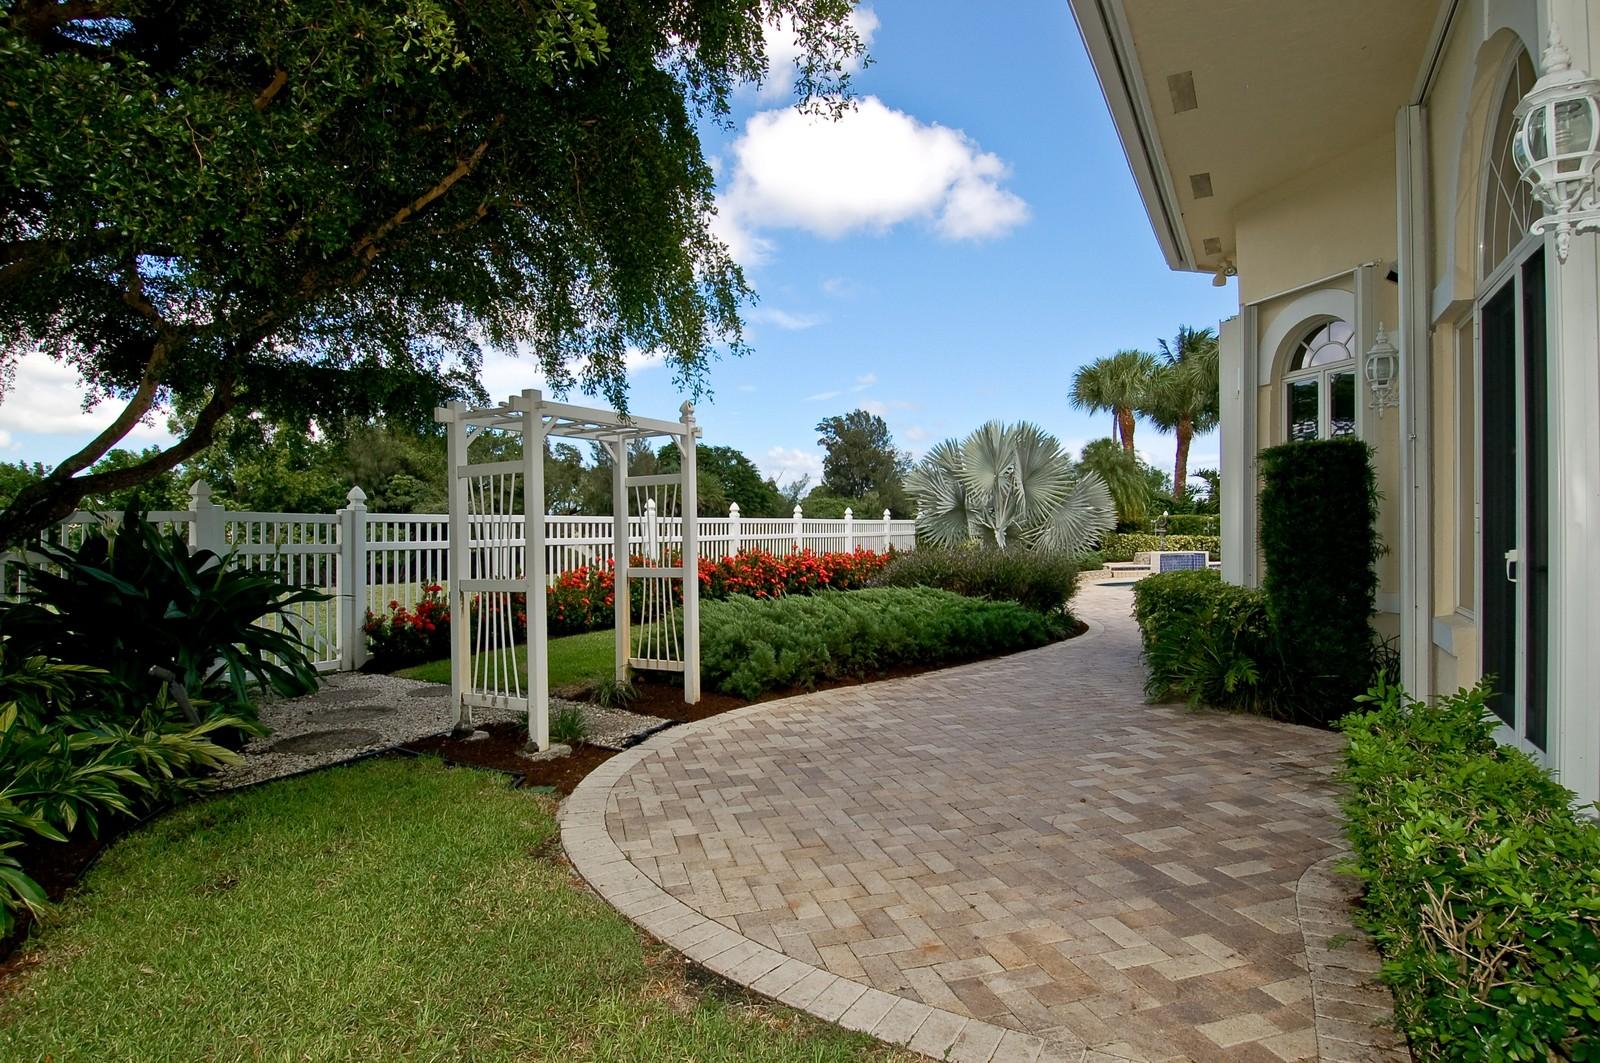 Real Estate Photography - 4252 Bocaire Blvd, Boca Raton, FL, 33487 - Back Yard